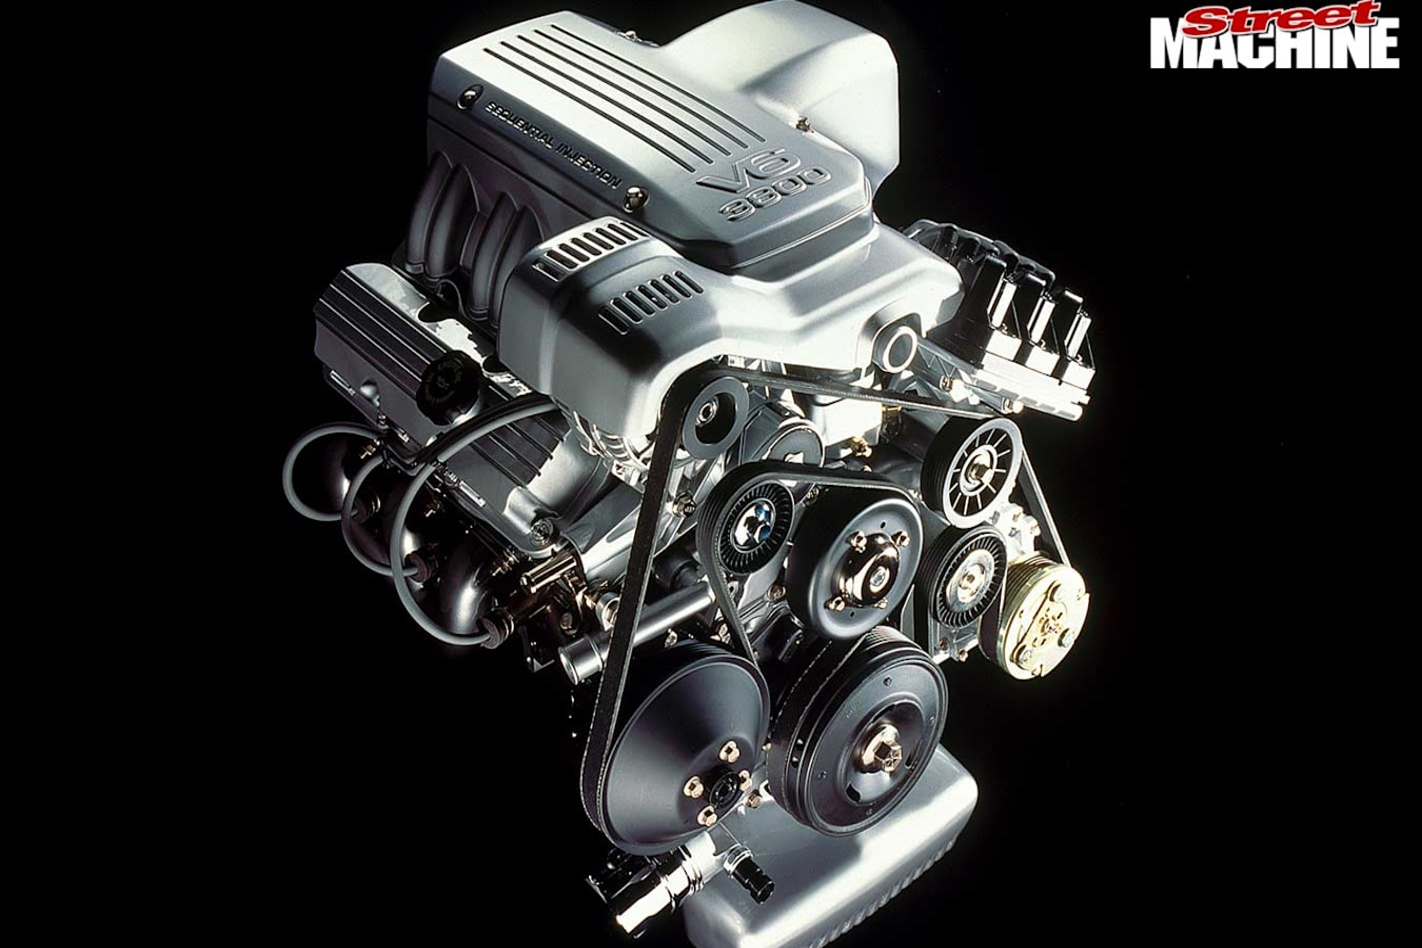 Holden Commodore engine